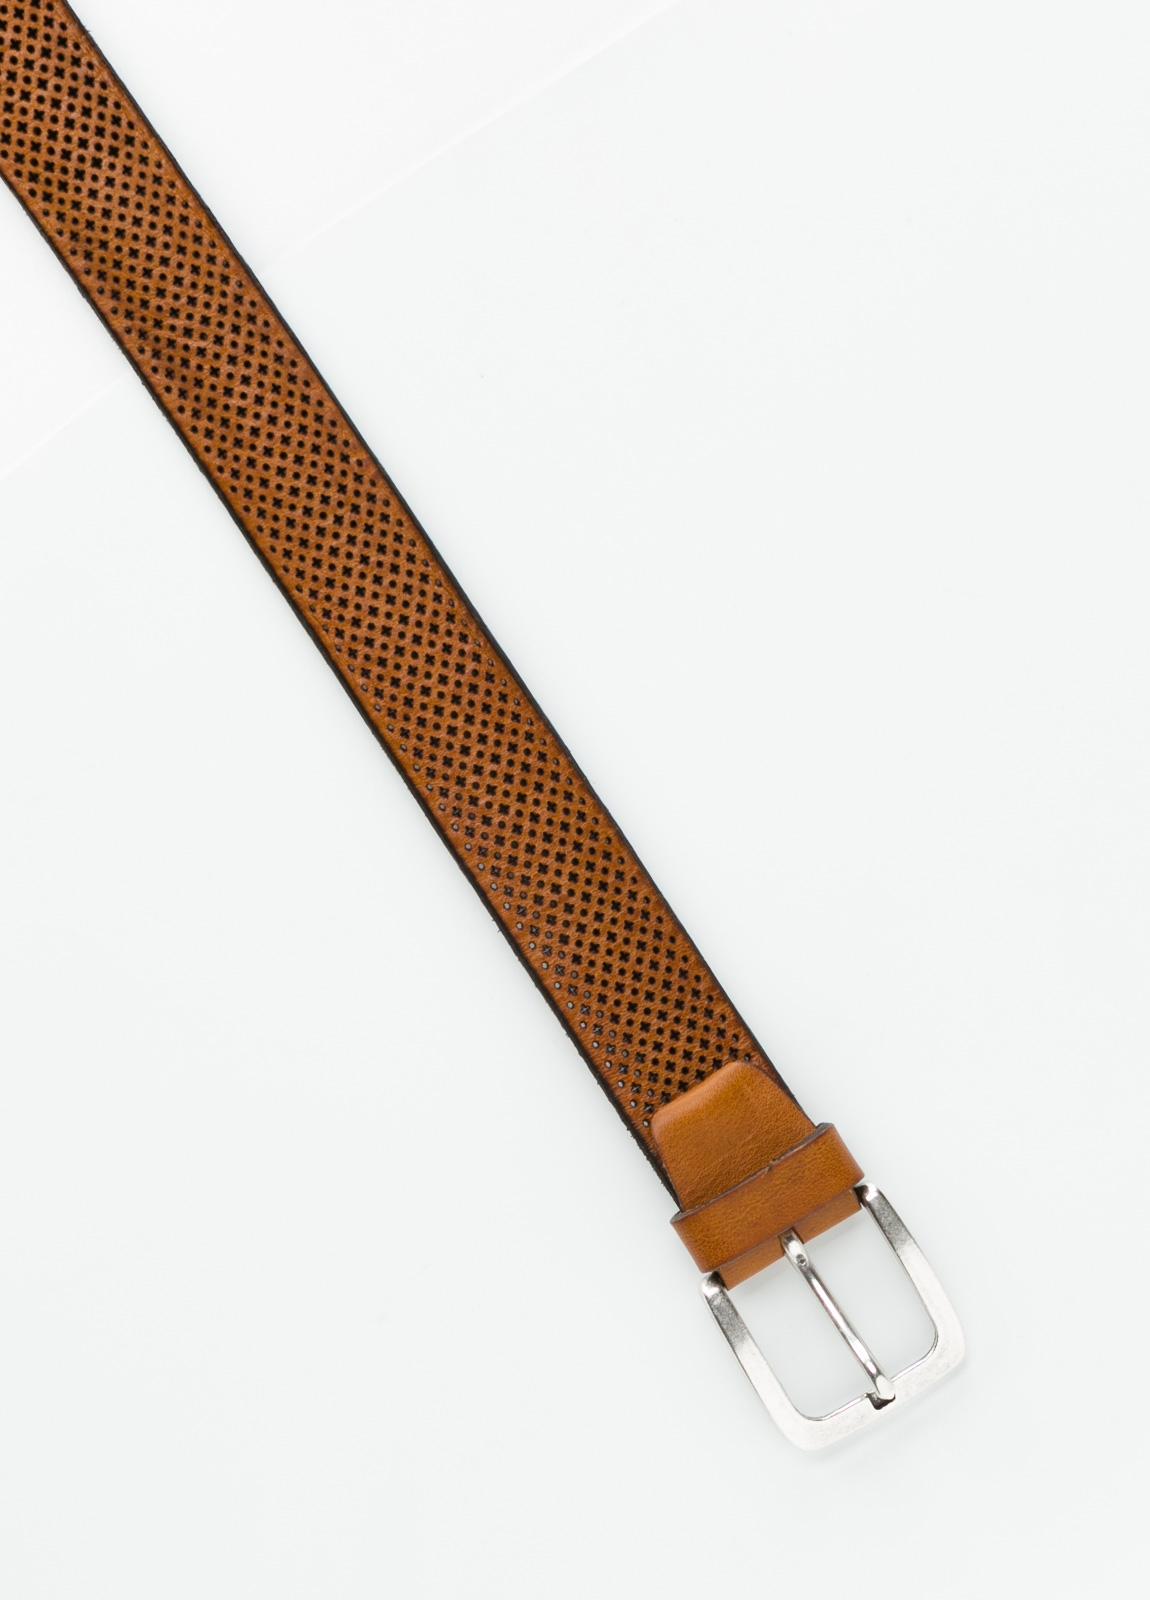 Cinturón sport dibujo perforado color cognac. 100% Piel. - Ítem1